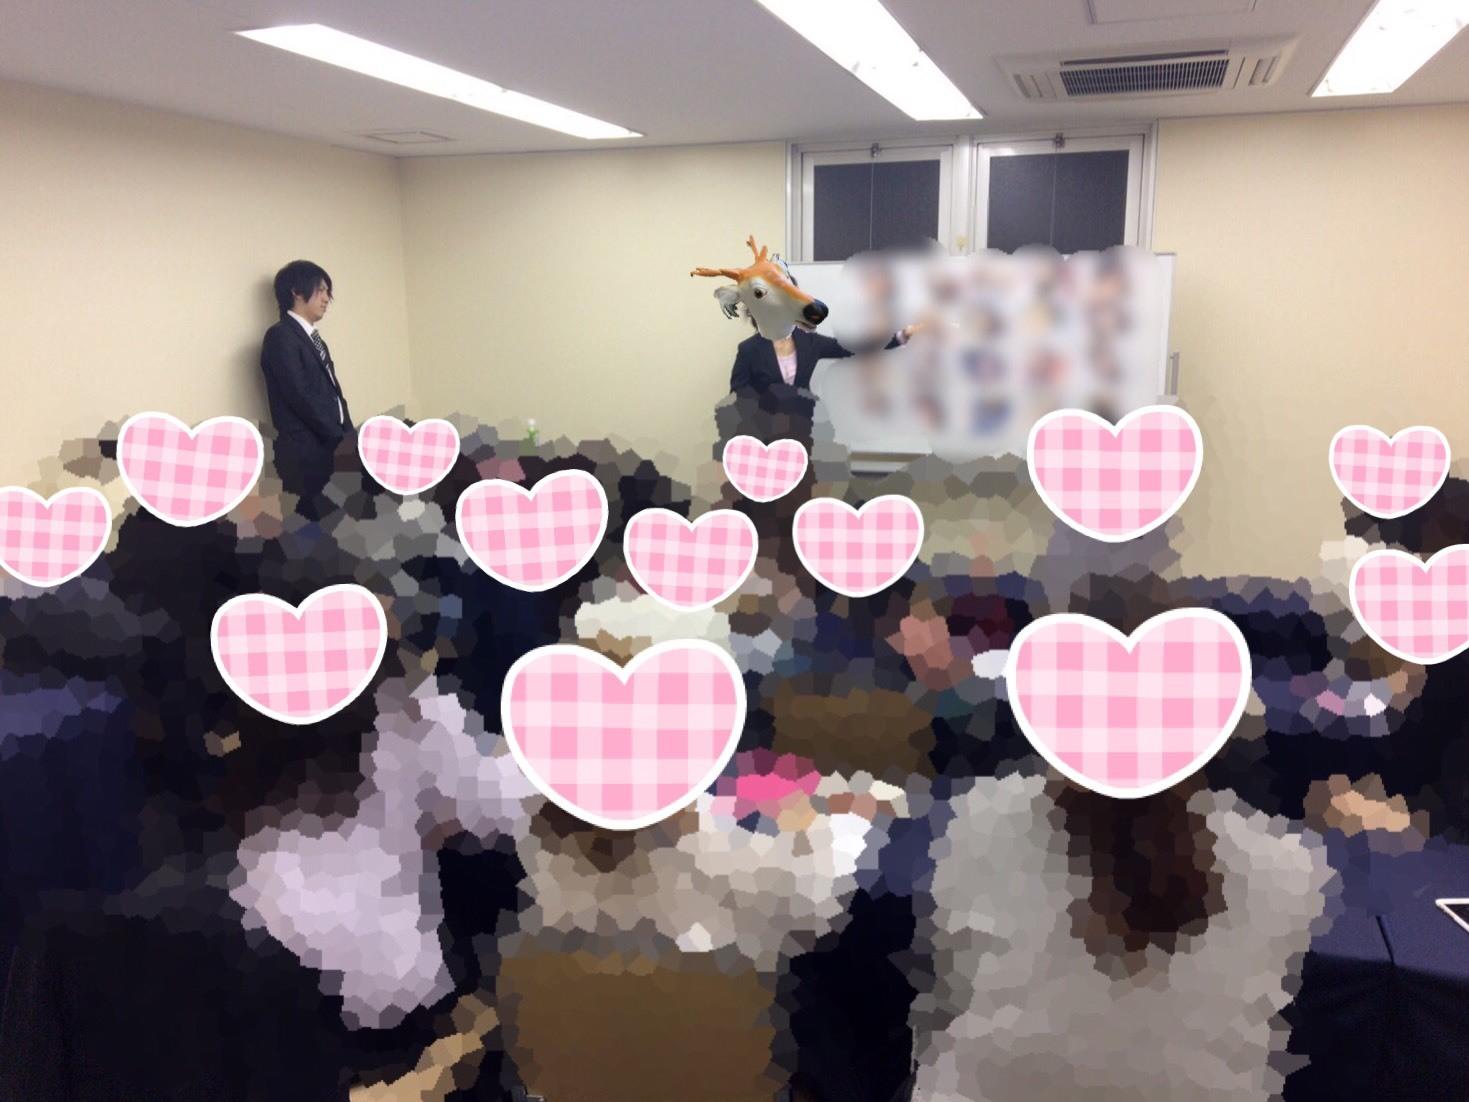 S__17055751.jpg